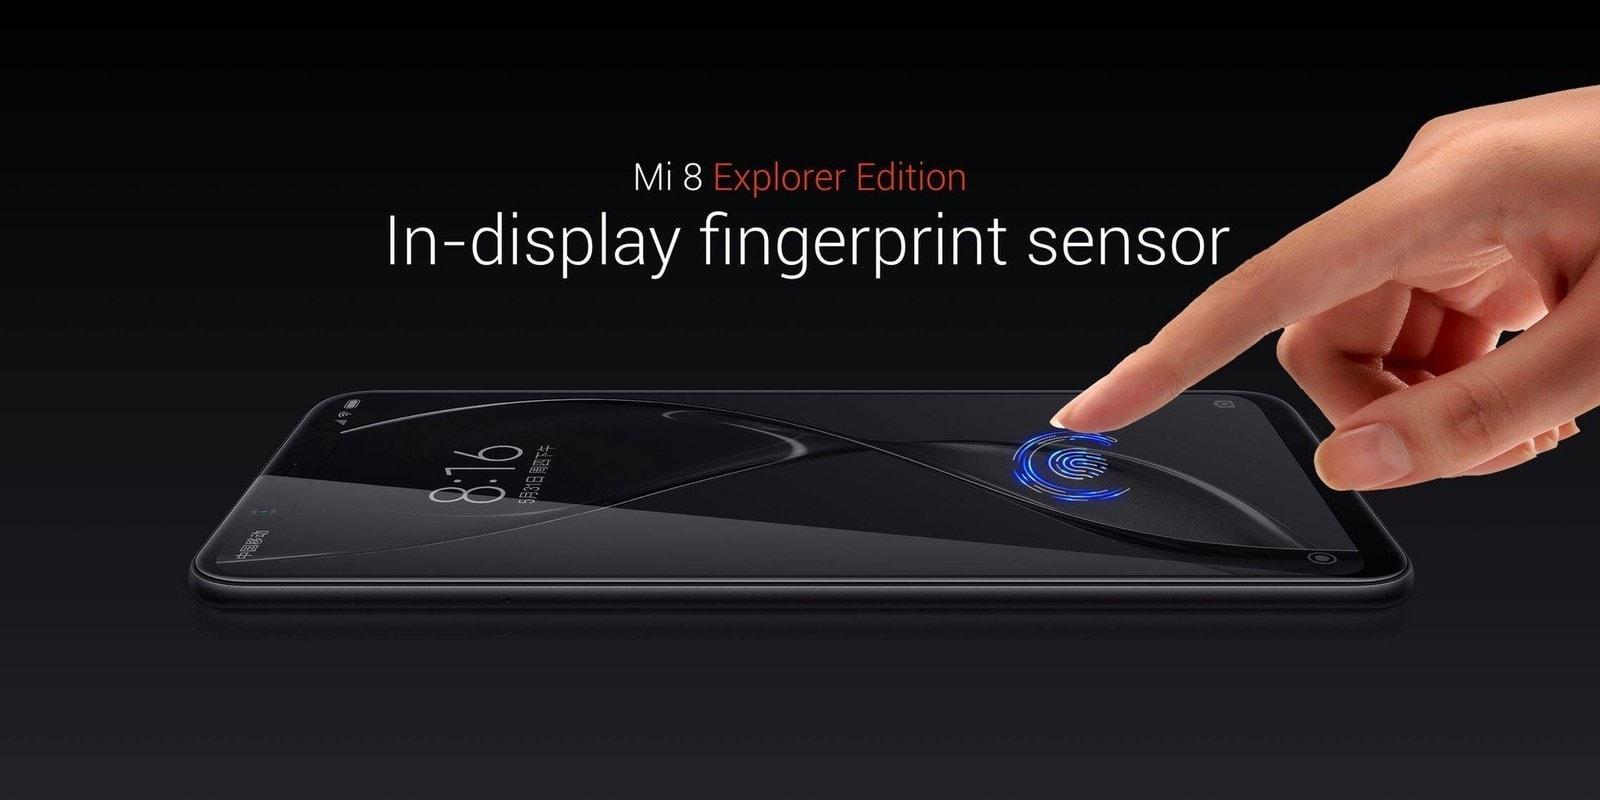 Xiaomi Mi 8 integrovaný odltacok prsta v displeji